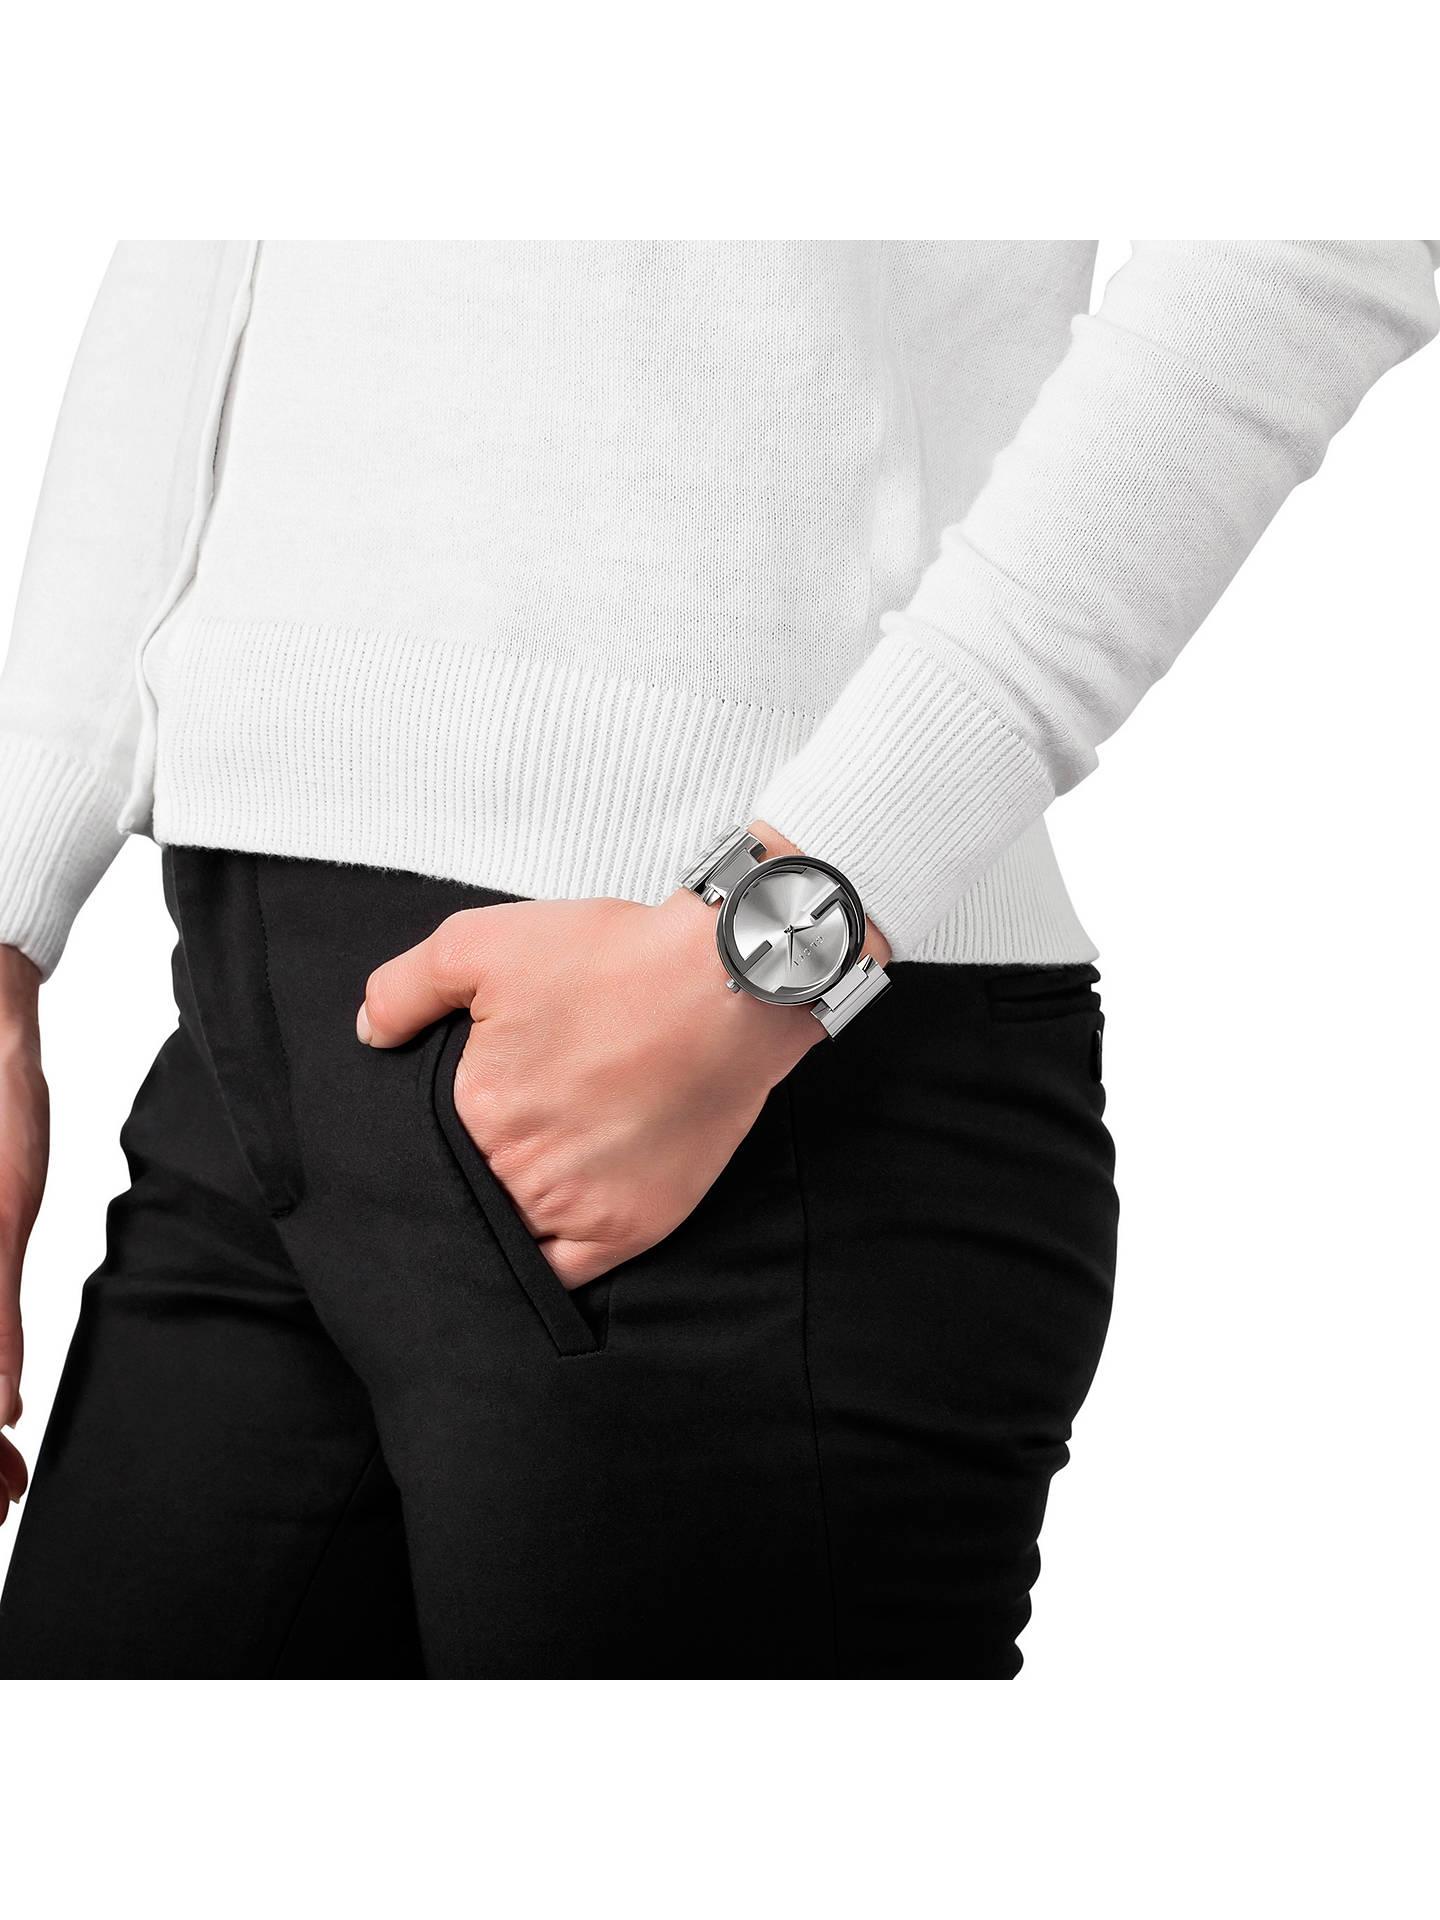 5837d7a8d6e ... Buy Gucci YA133308 Women s Interlocking G Bracelet Strap Watch